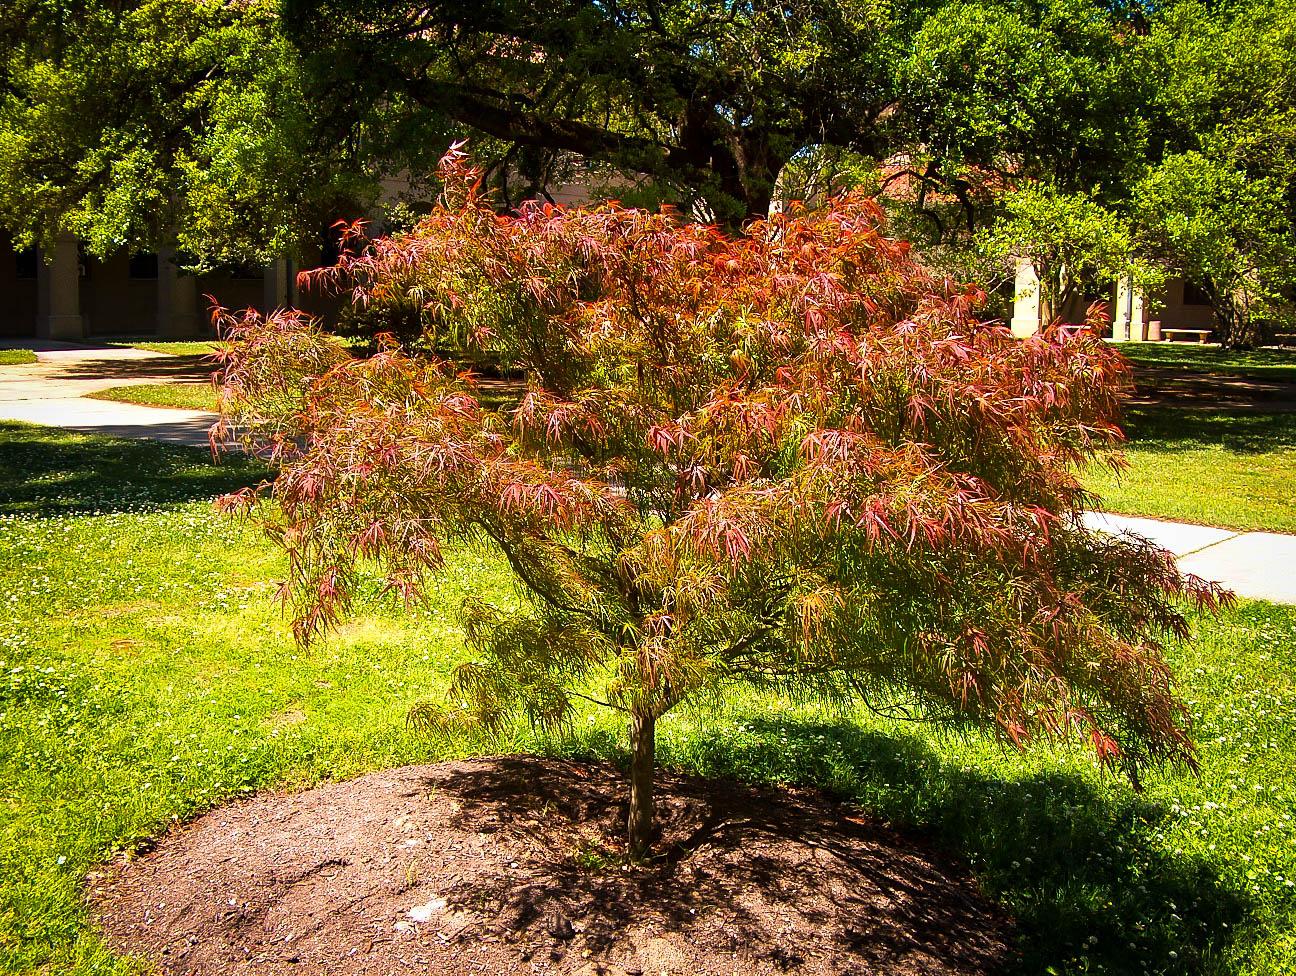 Villa Taranto Japanese Maple For Sale Online | The Tree Center